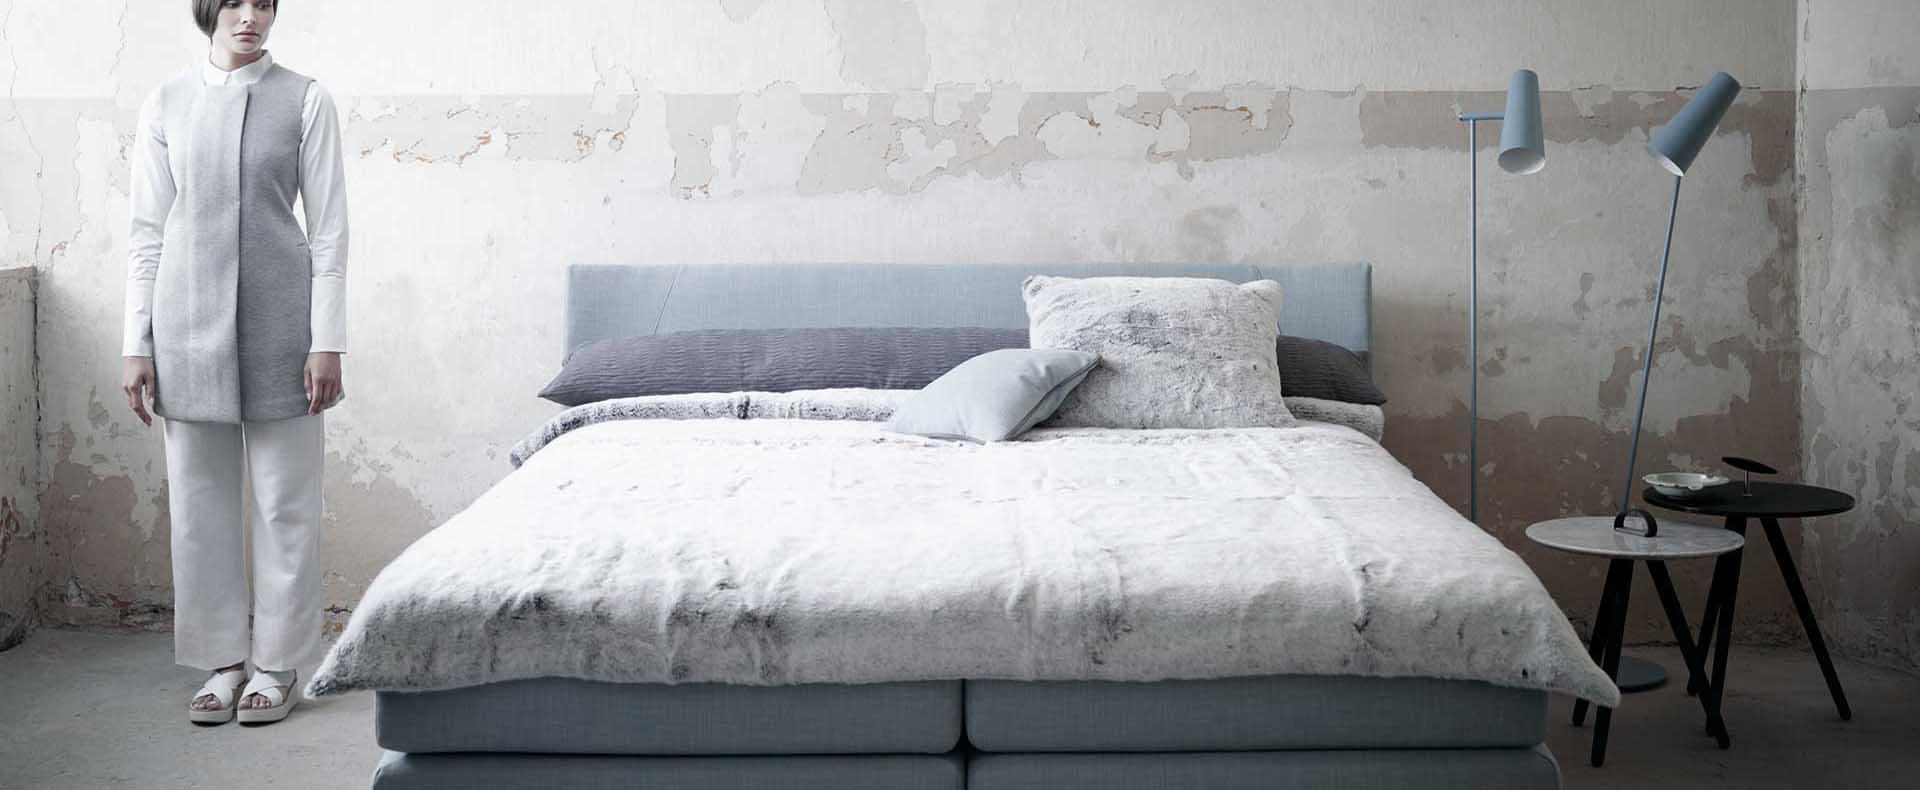 boxspring betten in t nisvorst nahe im raum krefeld. Black Bedroom Furniture Sets. Home Design Ideas